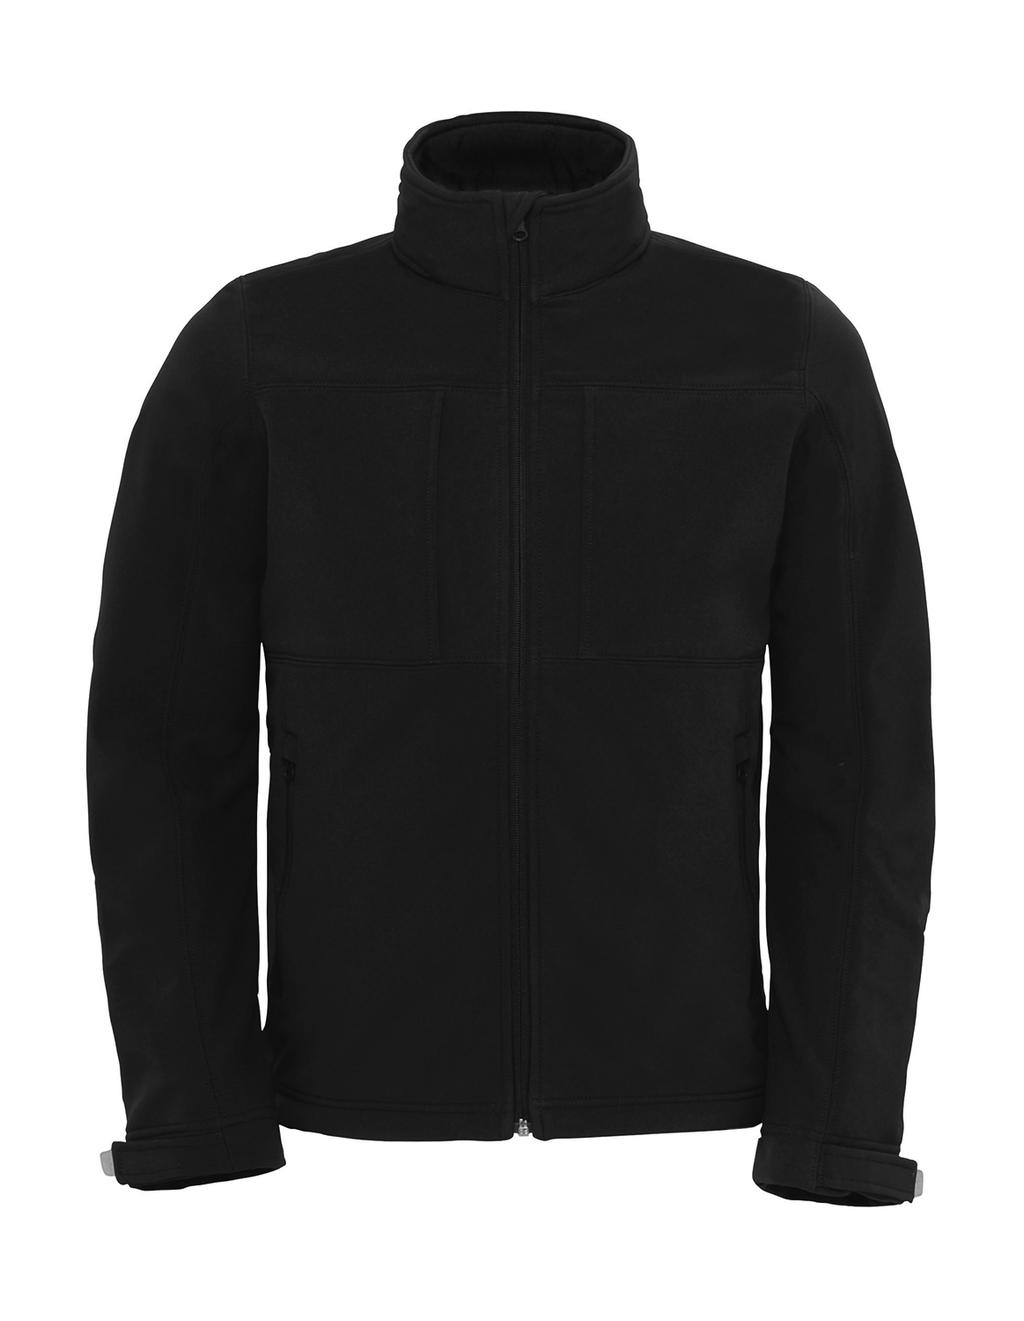 b c softshell jacke jacket hooded outdoor herren s m l xl xxl 3xl neu ebay. Black Bedroom Furniture Sets. Home Design Ideas